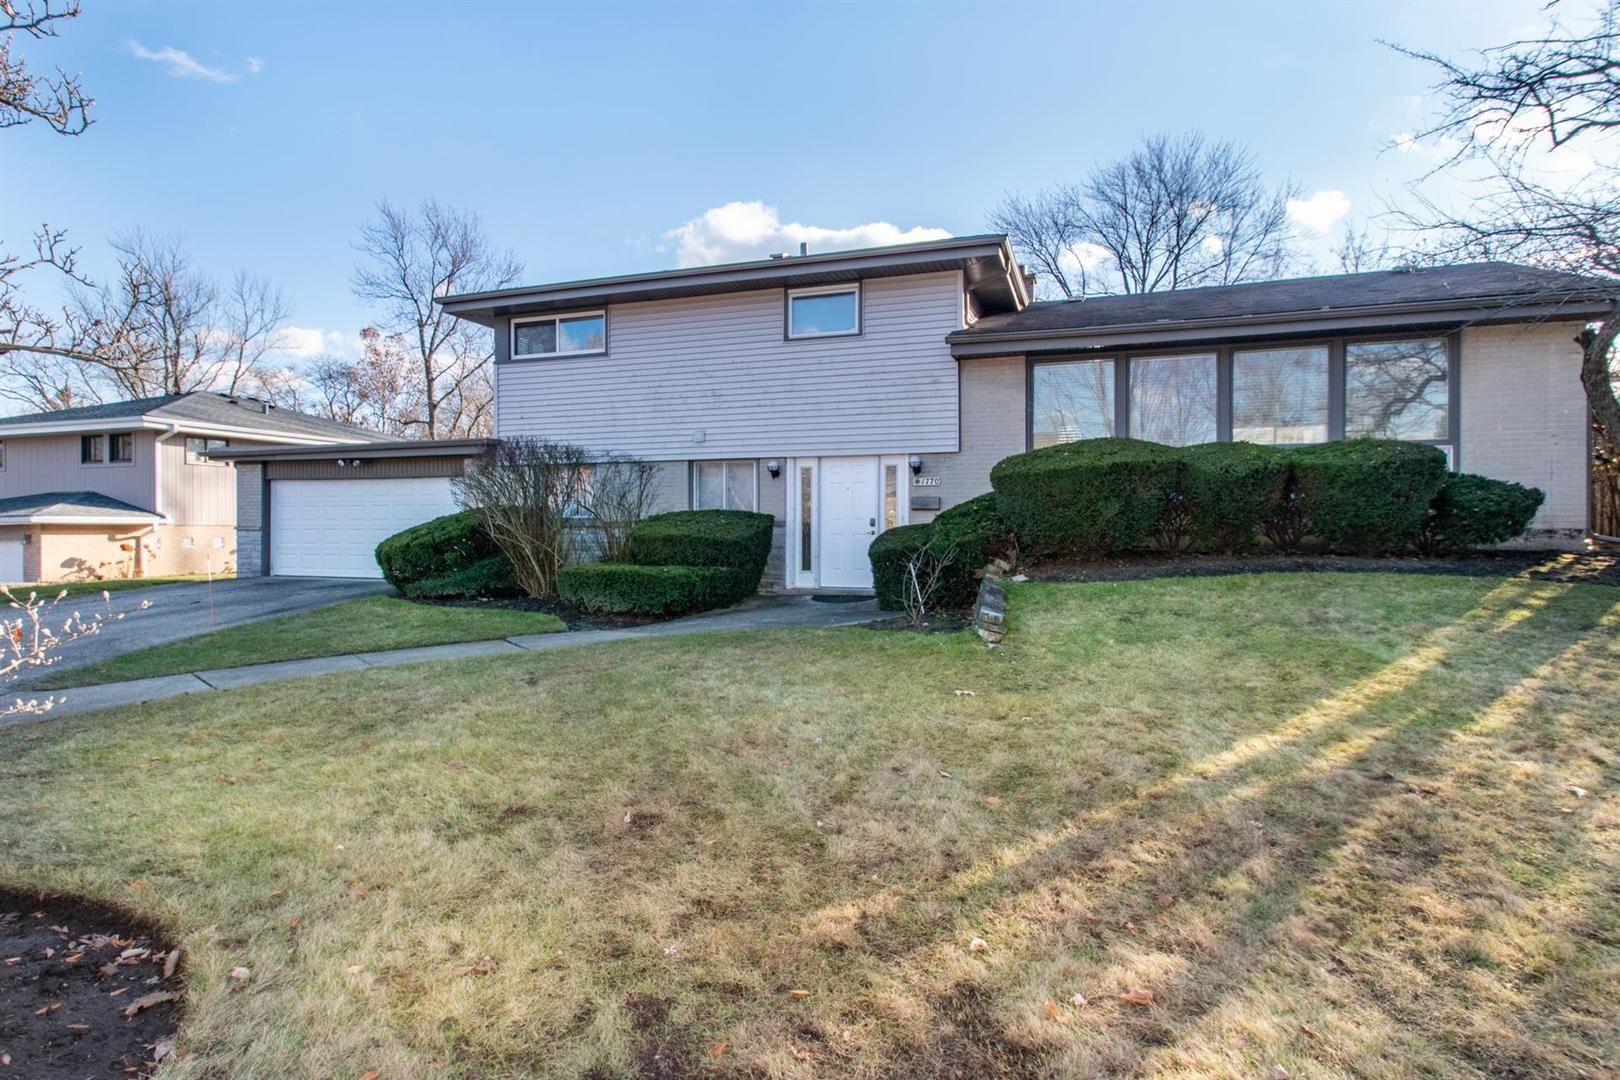 1770 Heather Lane, Highland Park, IL 60035 - #: 10587798